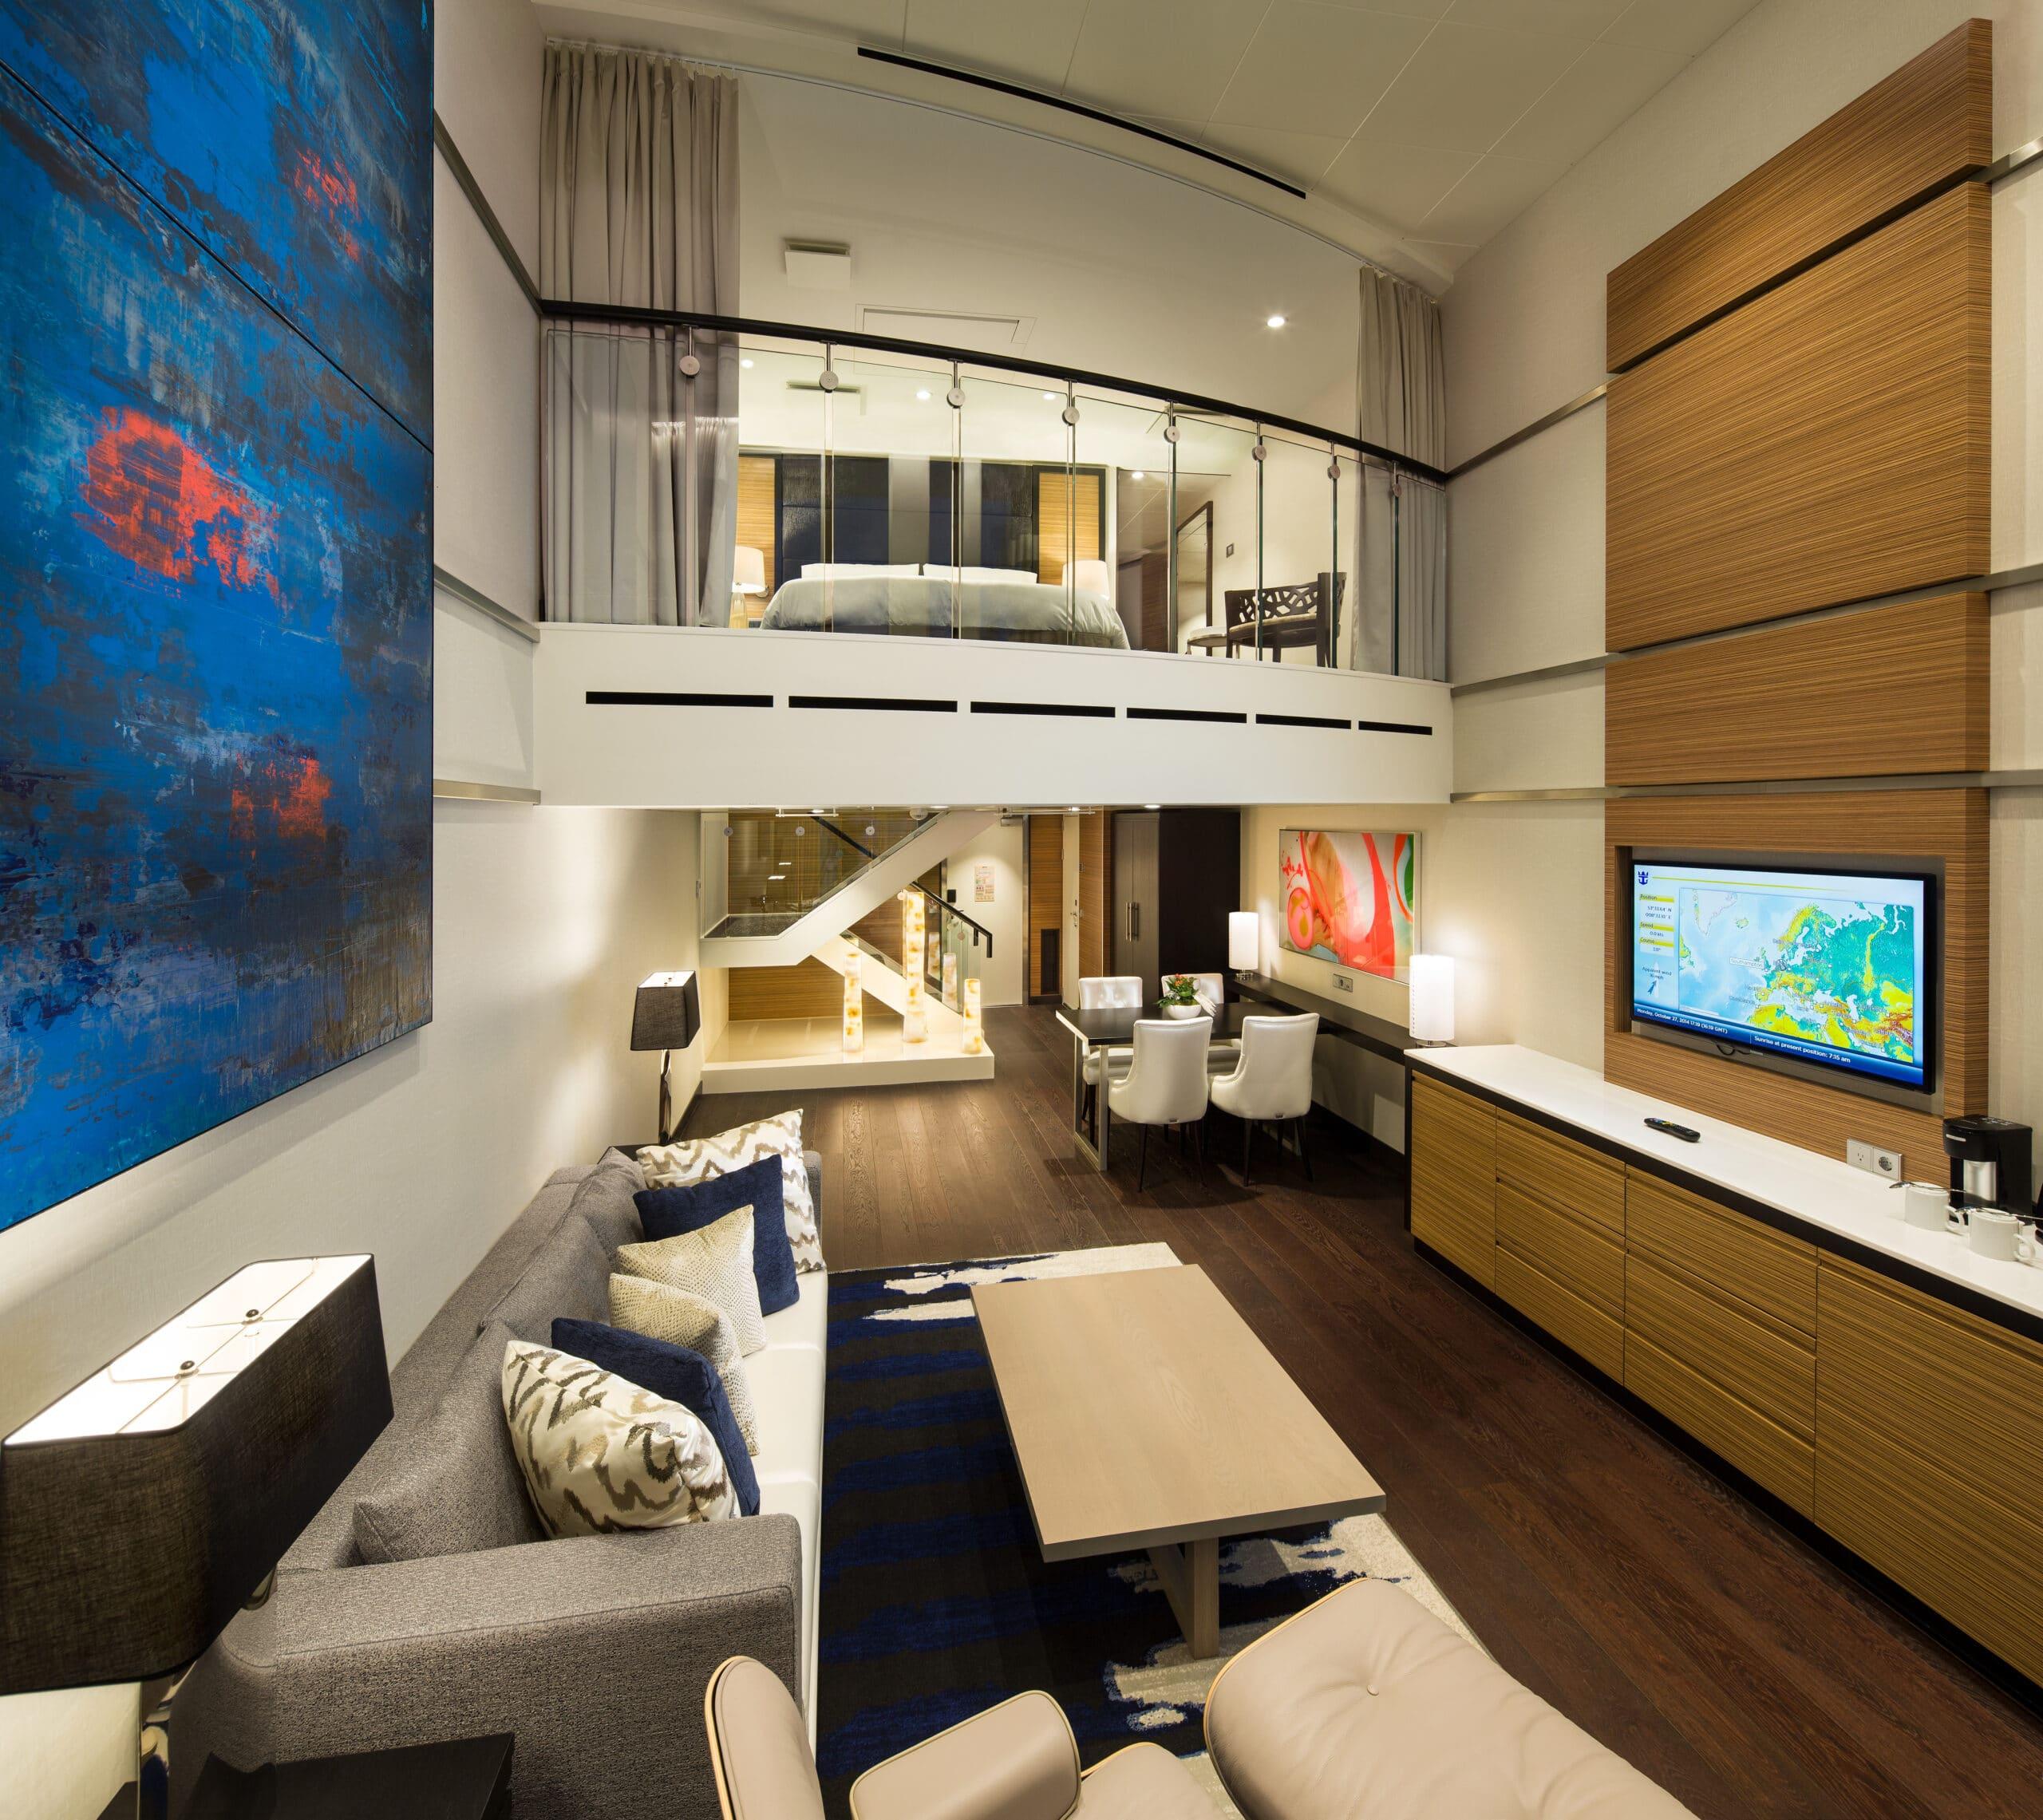 Royal-Caribbean-International-Anthem-Quantum-Ovation-of-the-seas-schip-cruiseschip-categorie-SL-Sky-Loft-Suite